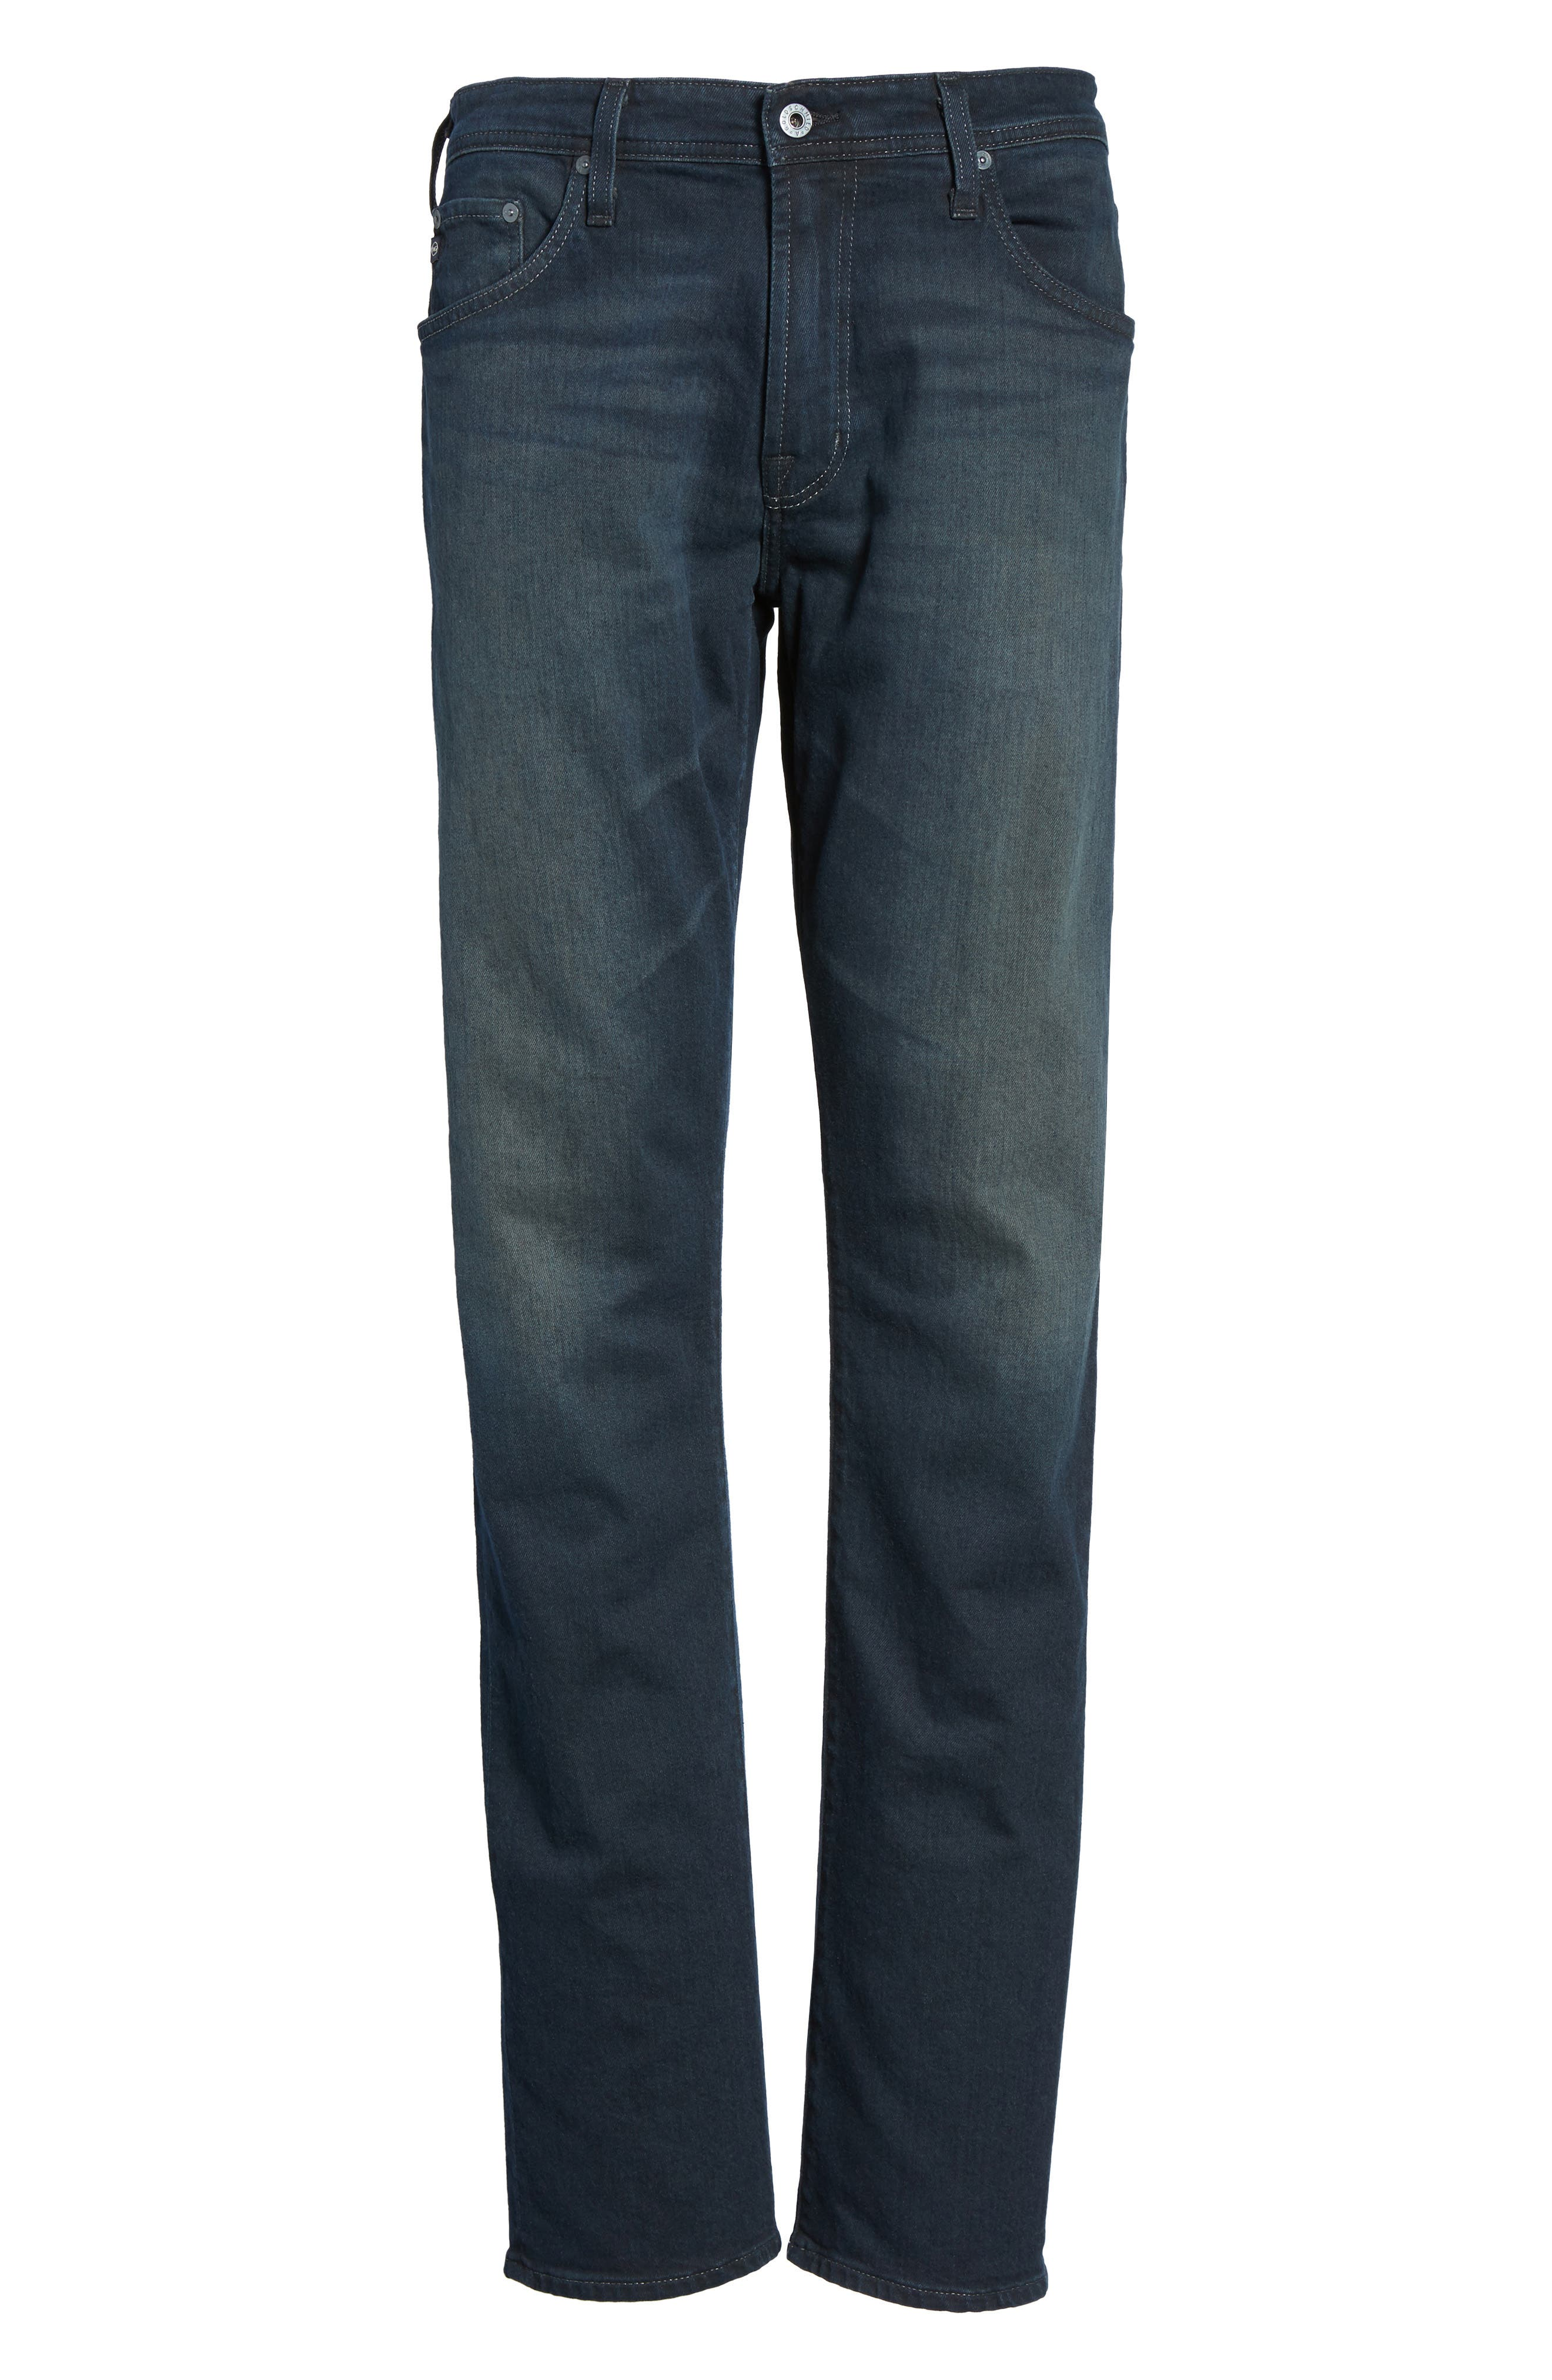 Ives Straight Fit Jeans,                             Alternate thumbnail 6, color,                             Blue Smolder